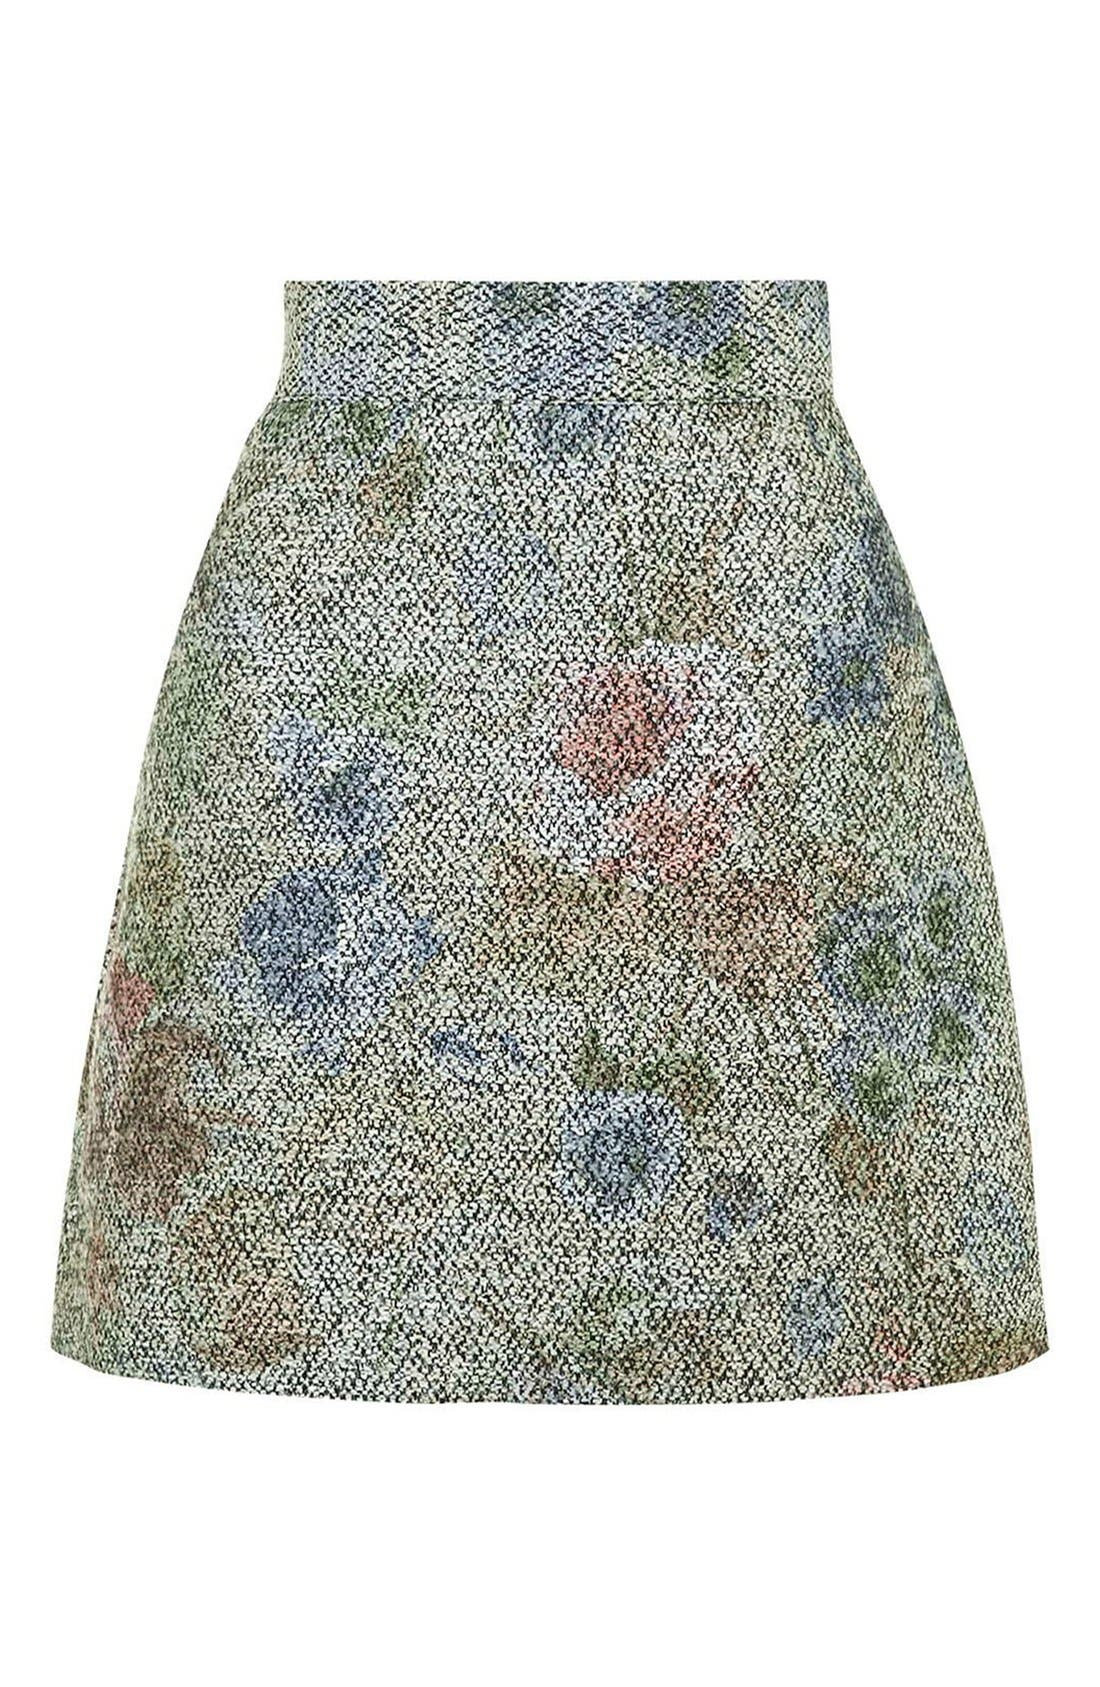 Alternate Image 4  - Topshop Metallic Floral Bouclé Skirt